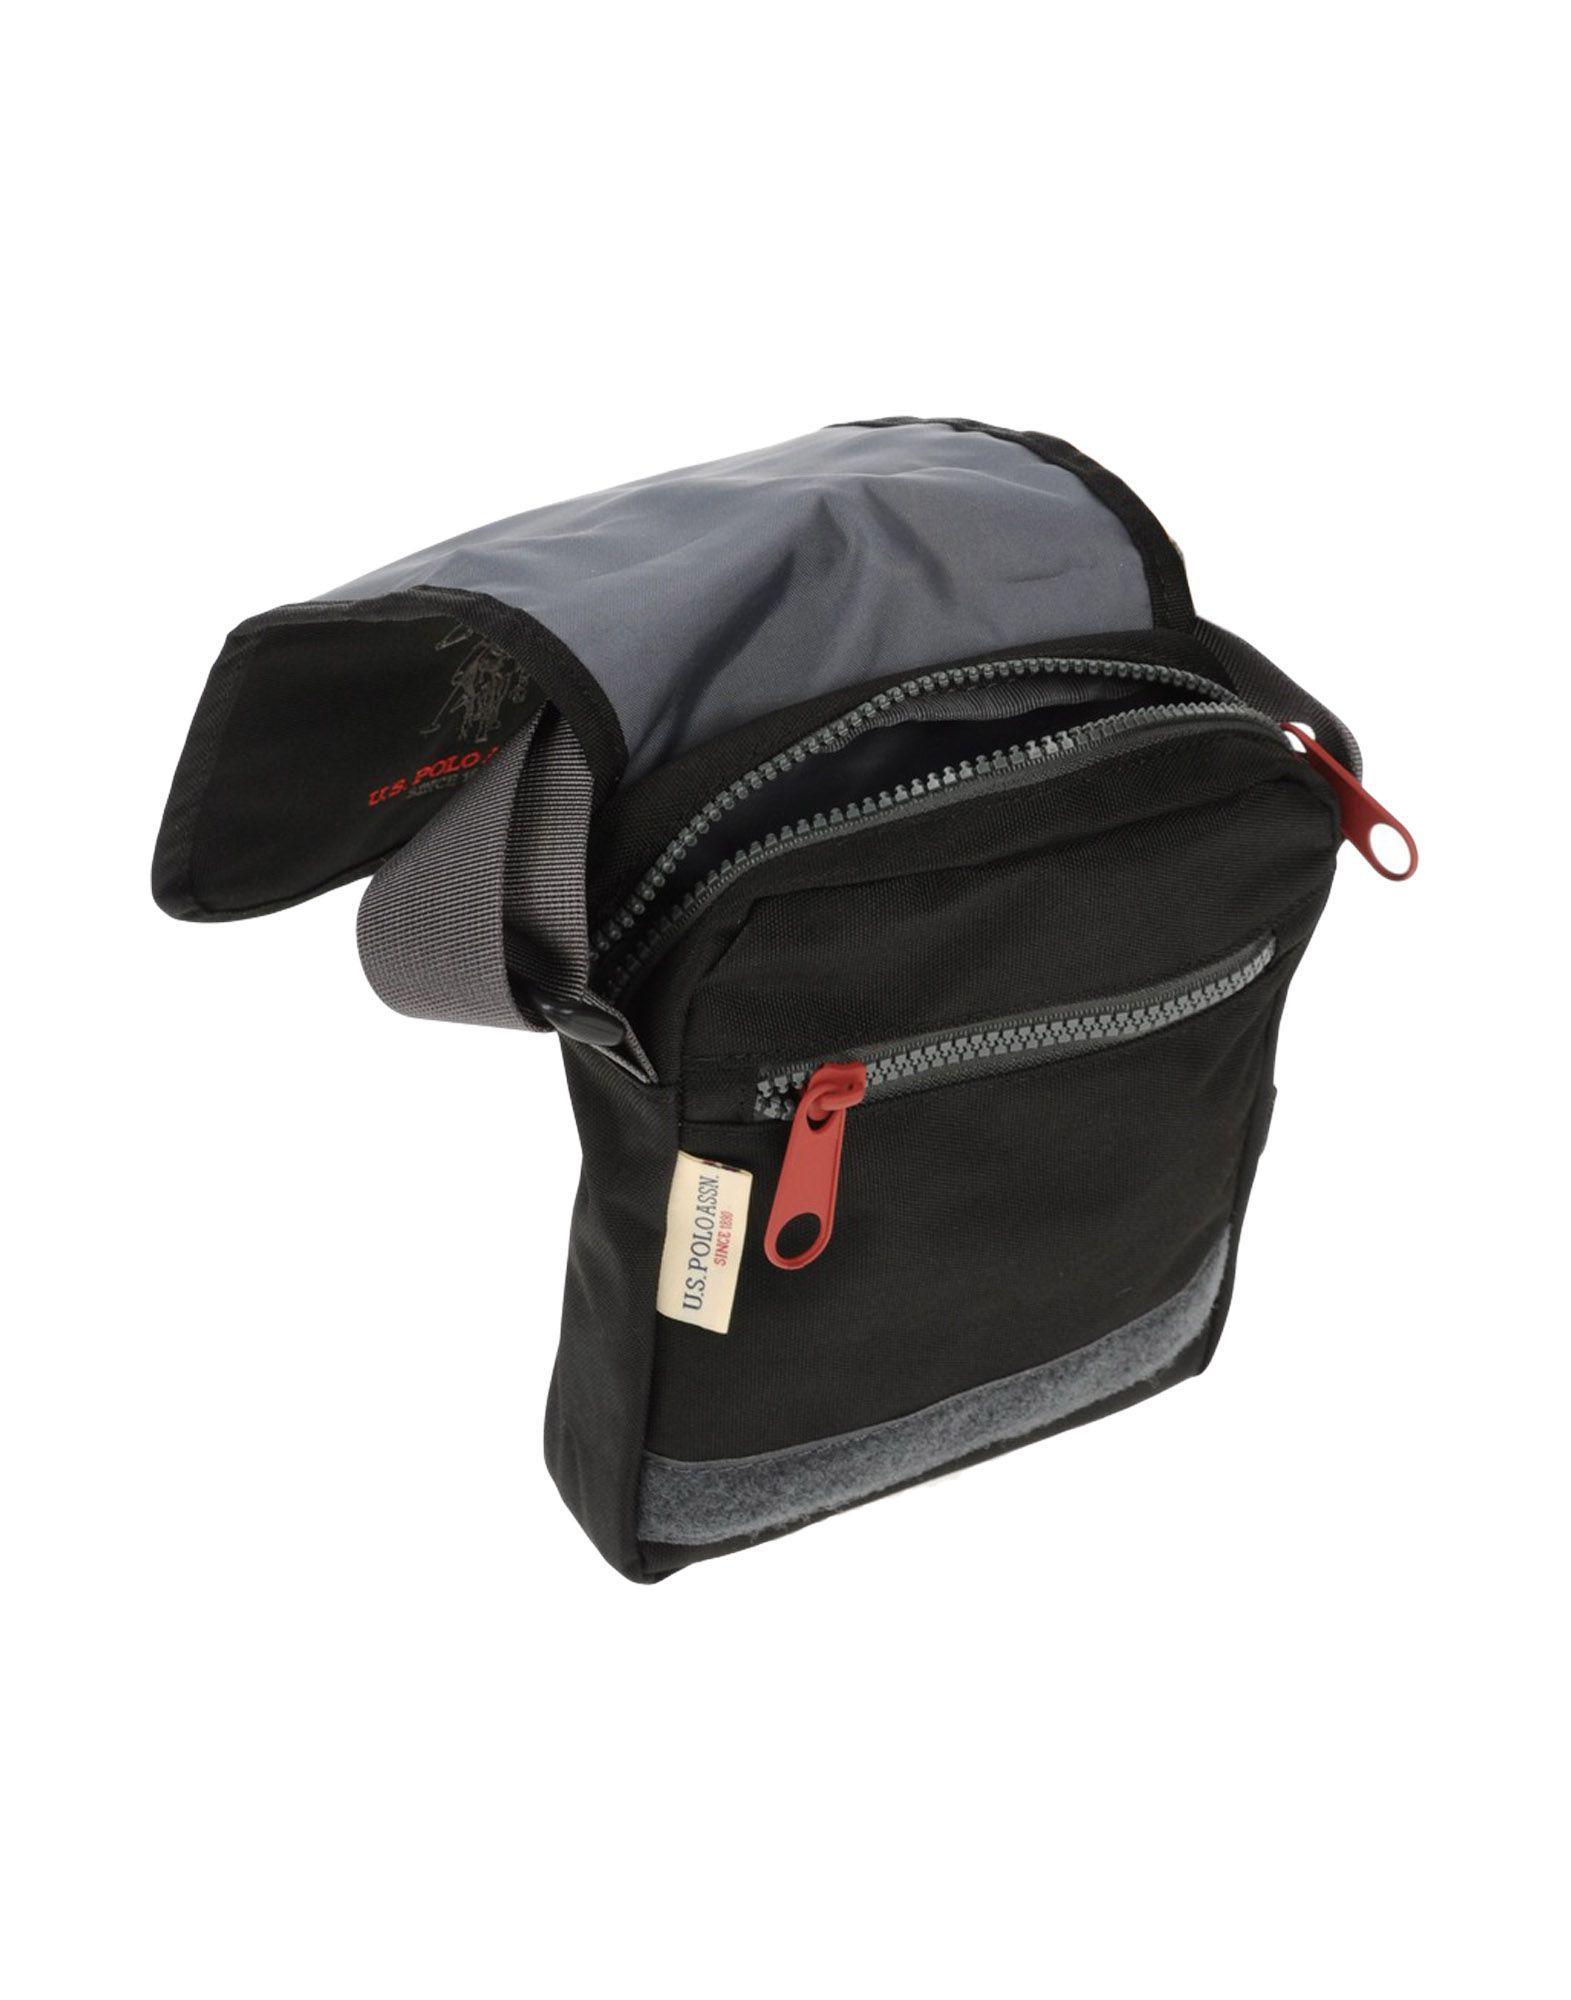 U.S. POLO ASSN. Canvas Cross-body Bag in Black